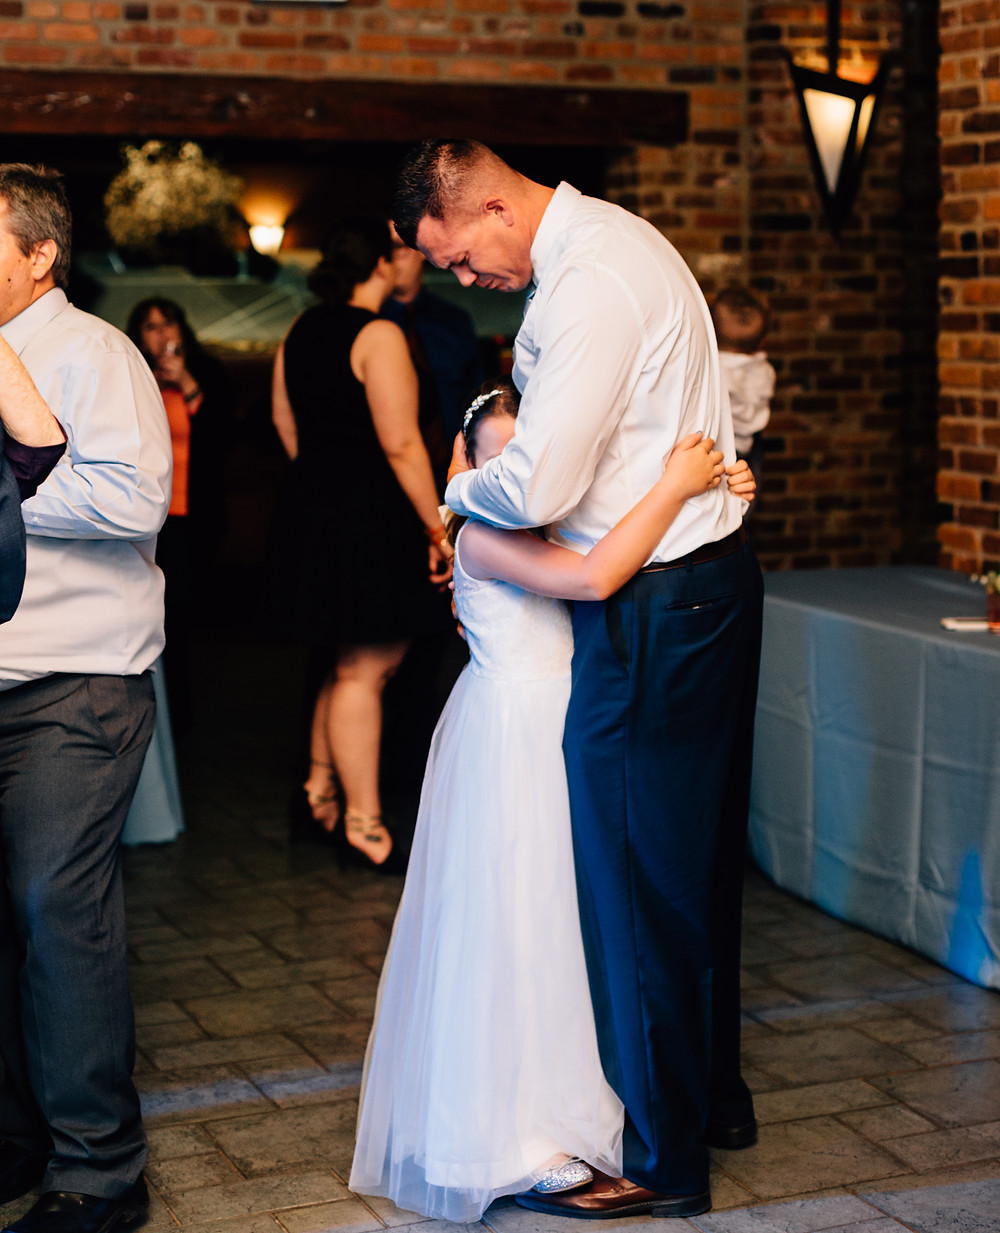 Emotional moment at wedding